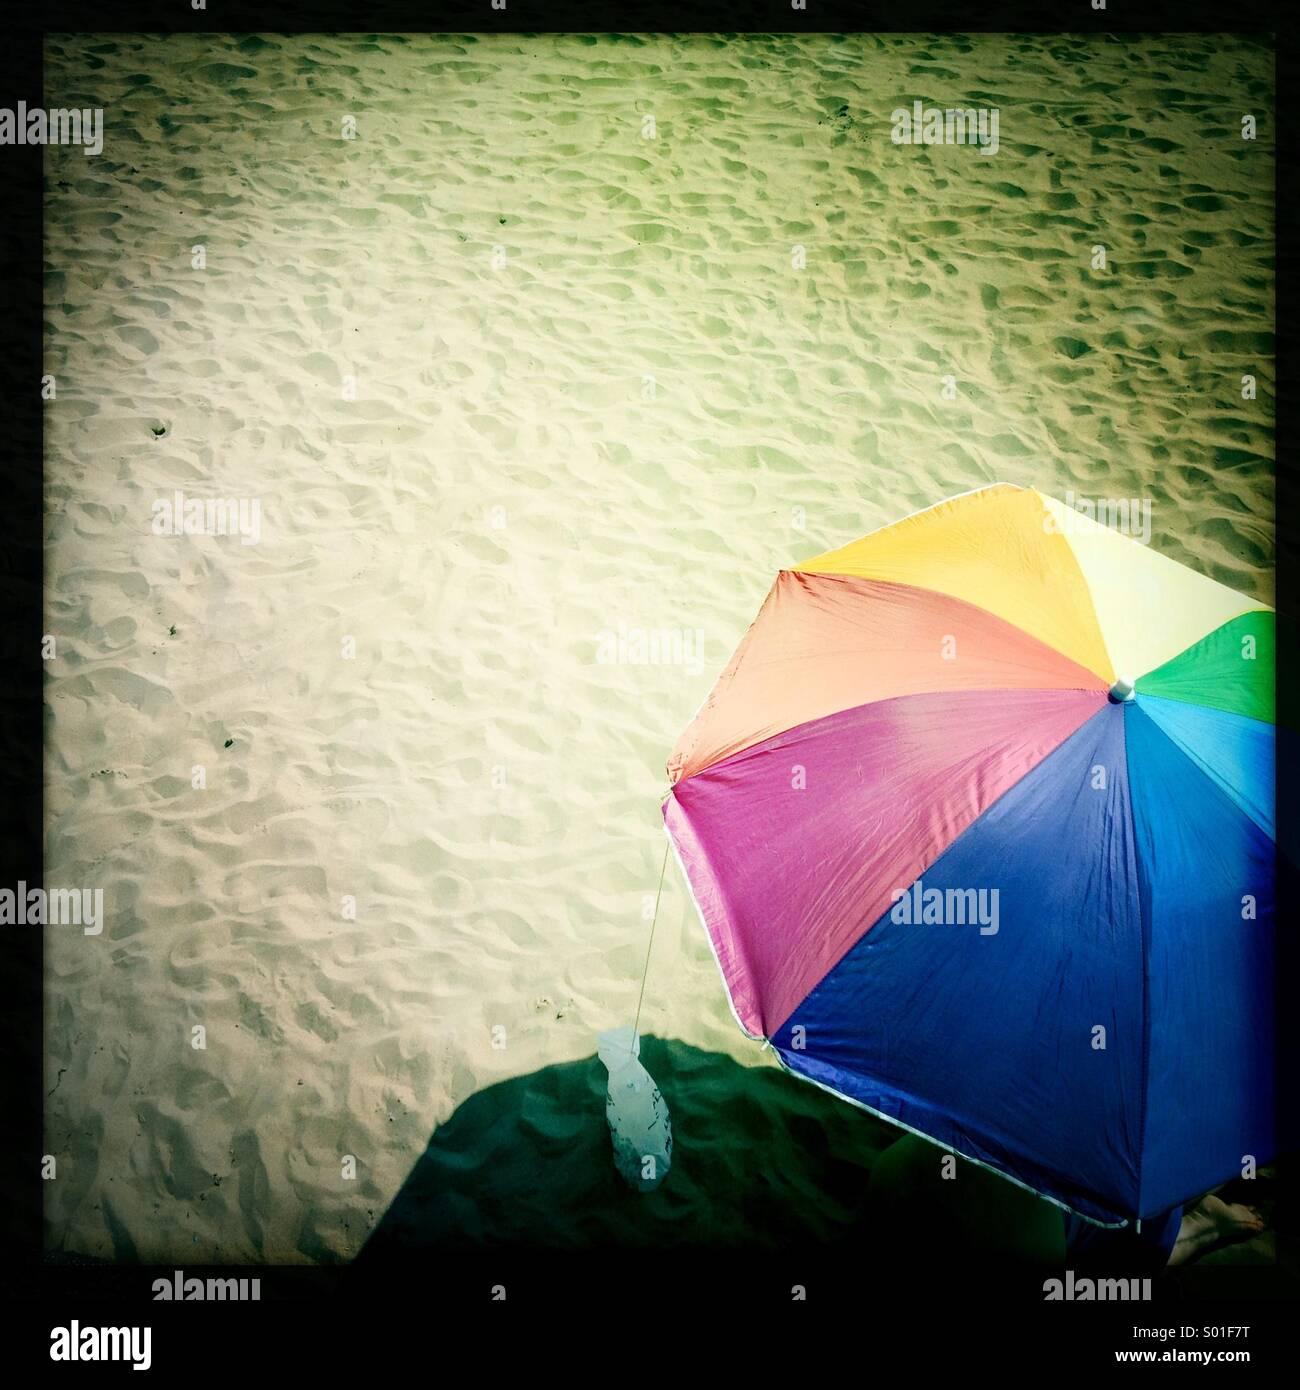 Umbrella on a sandy beach - Stock Image